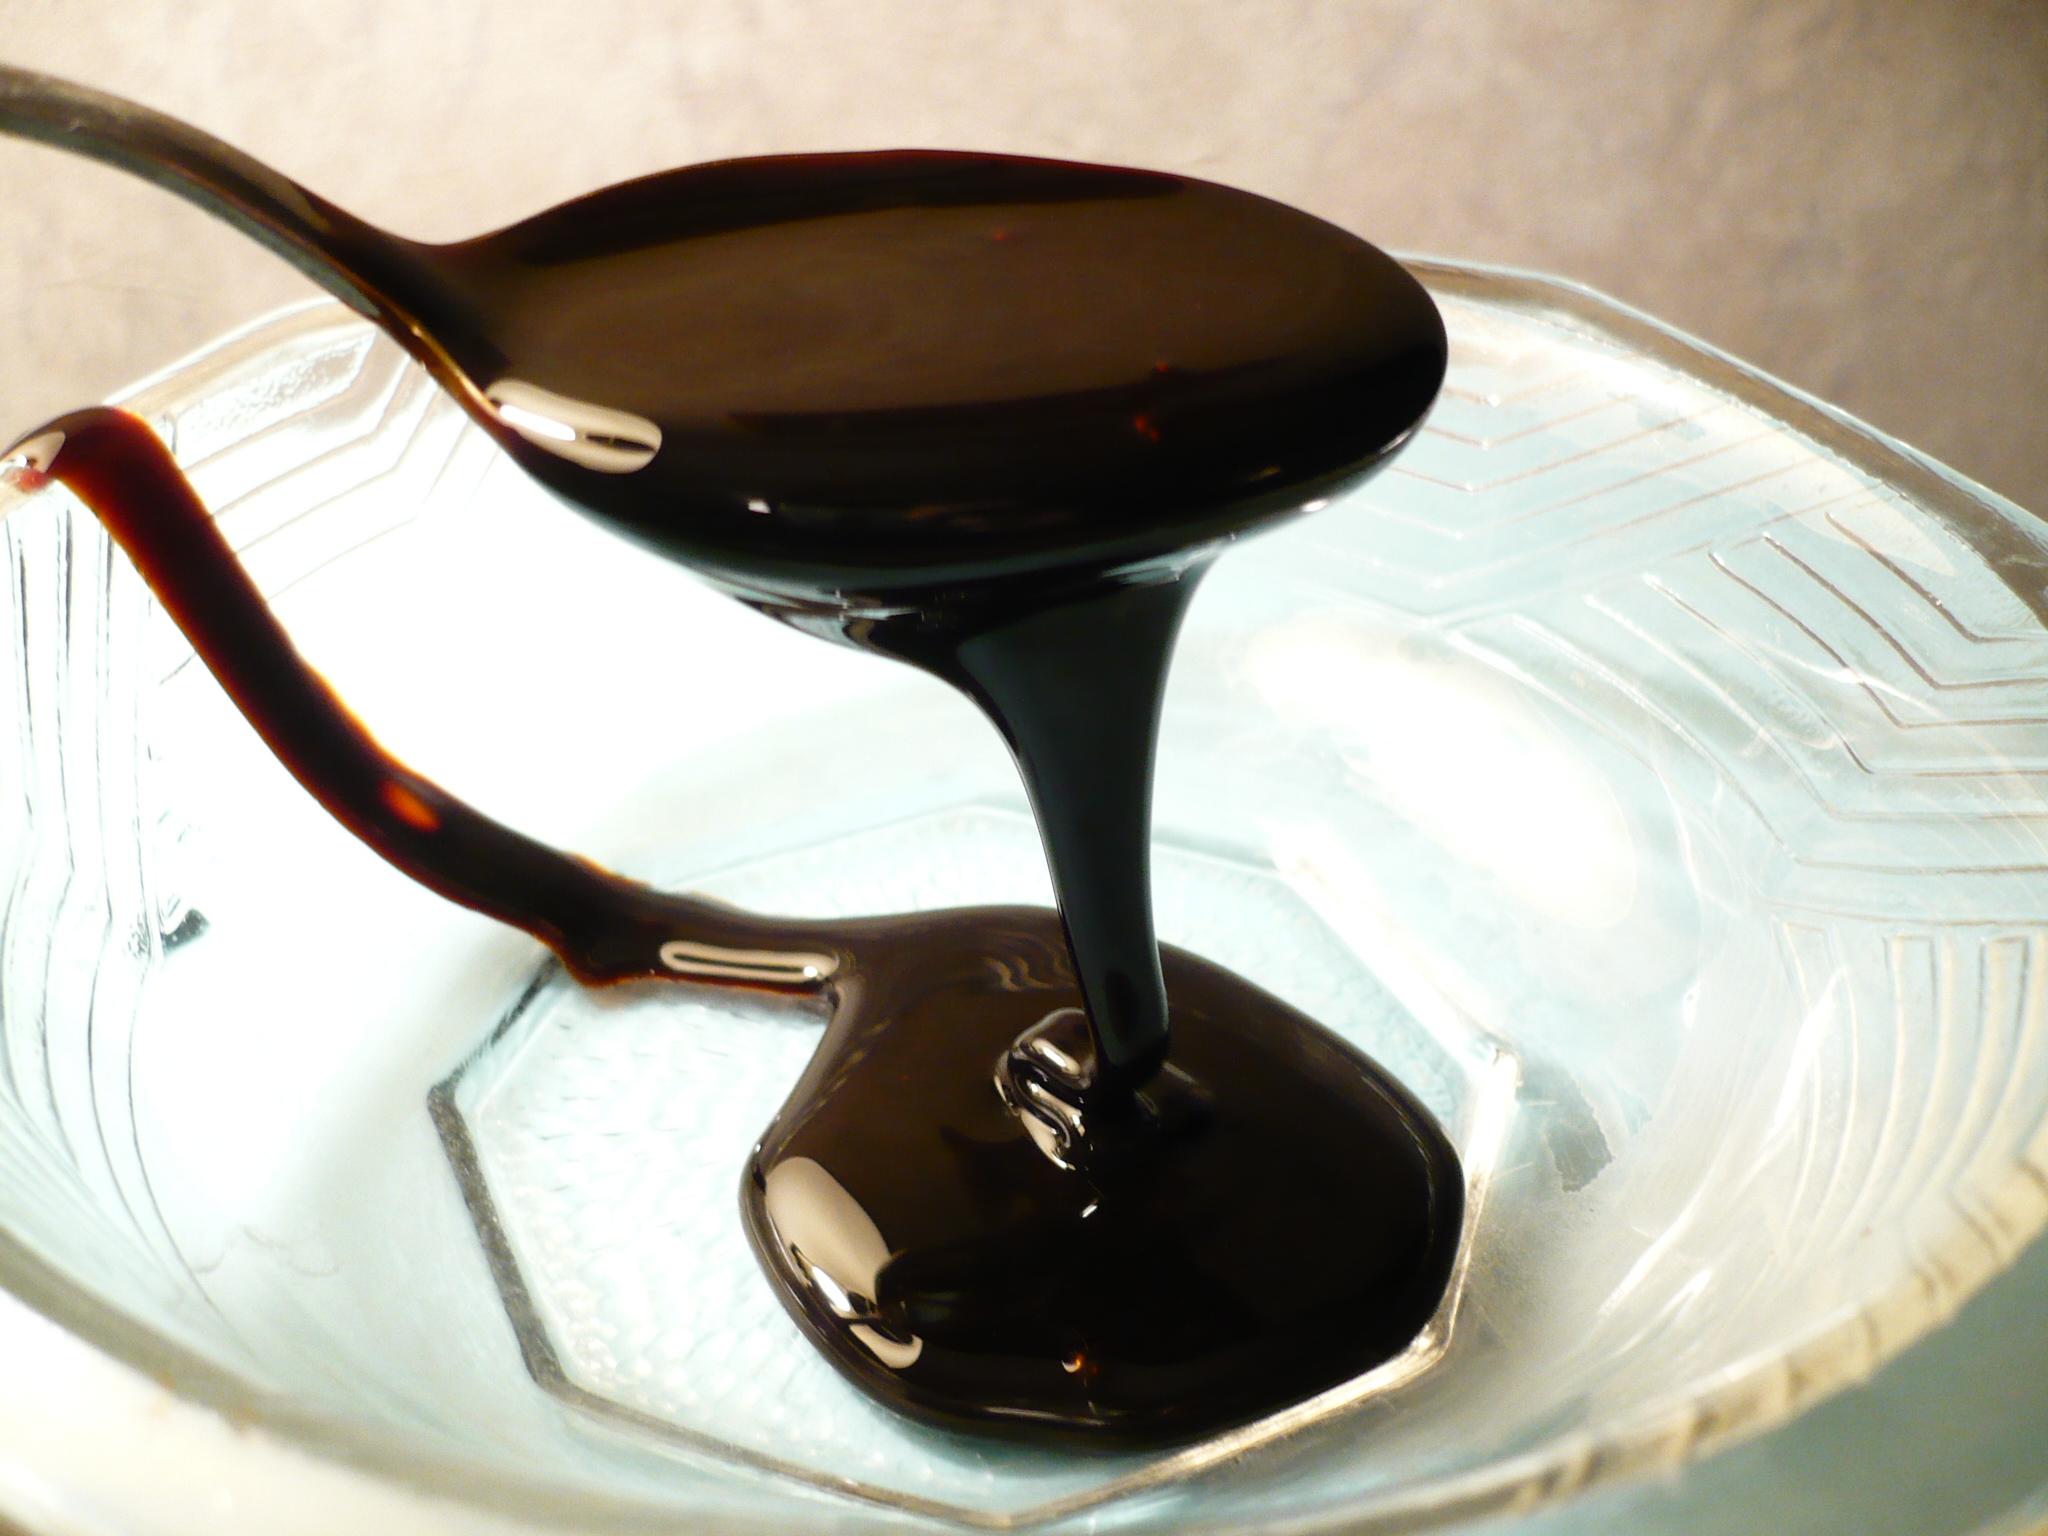 blackstrap molasses in a bowl as a natural remedy to gray hair